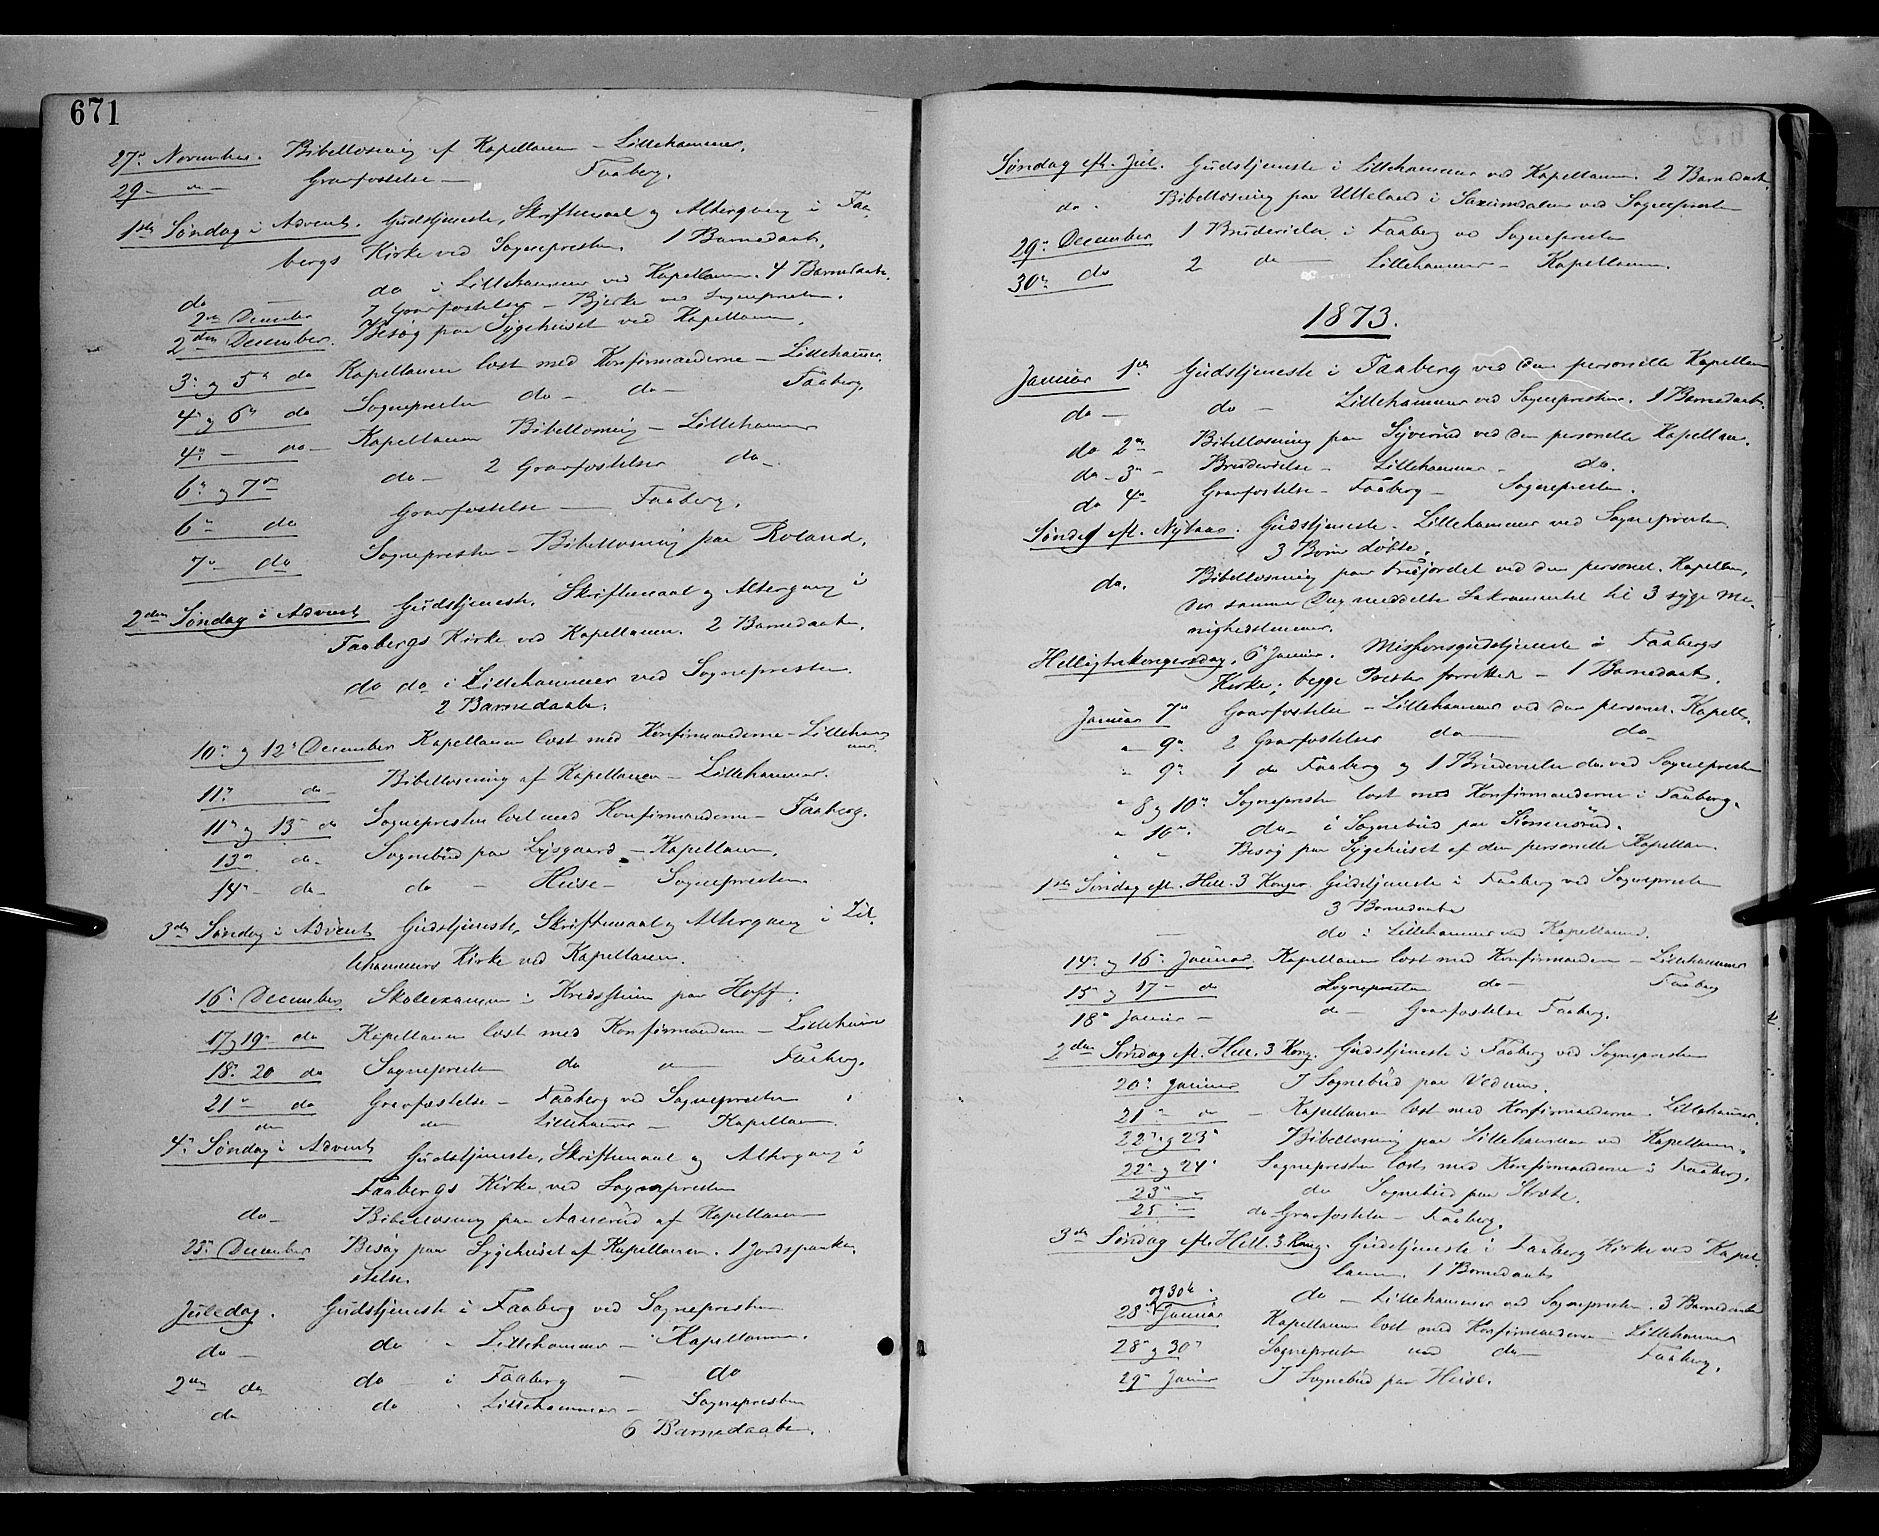 SAH, Fåberg prestekontor, Ministerialbok nr. 7, 1868-1878, s. 671